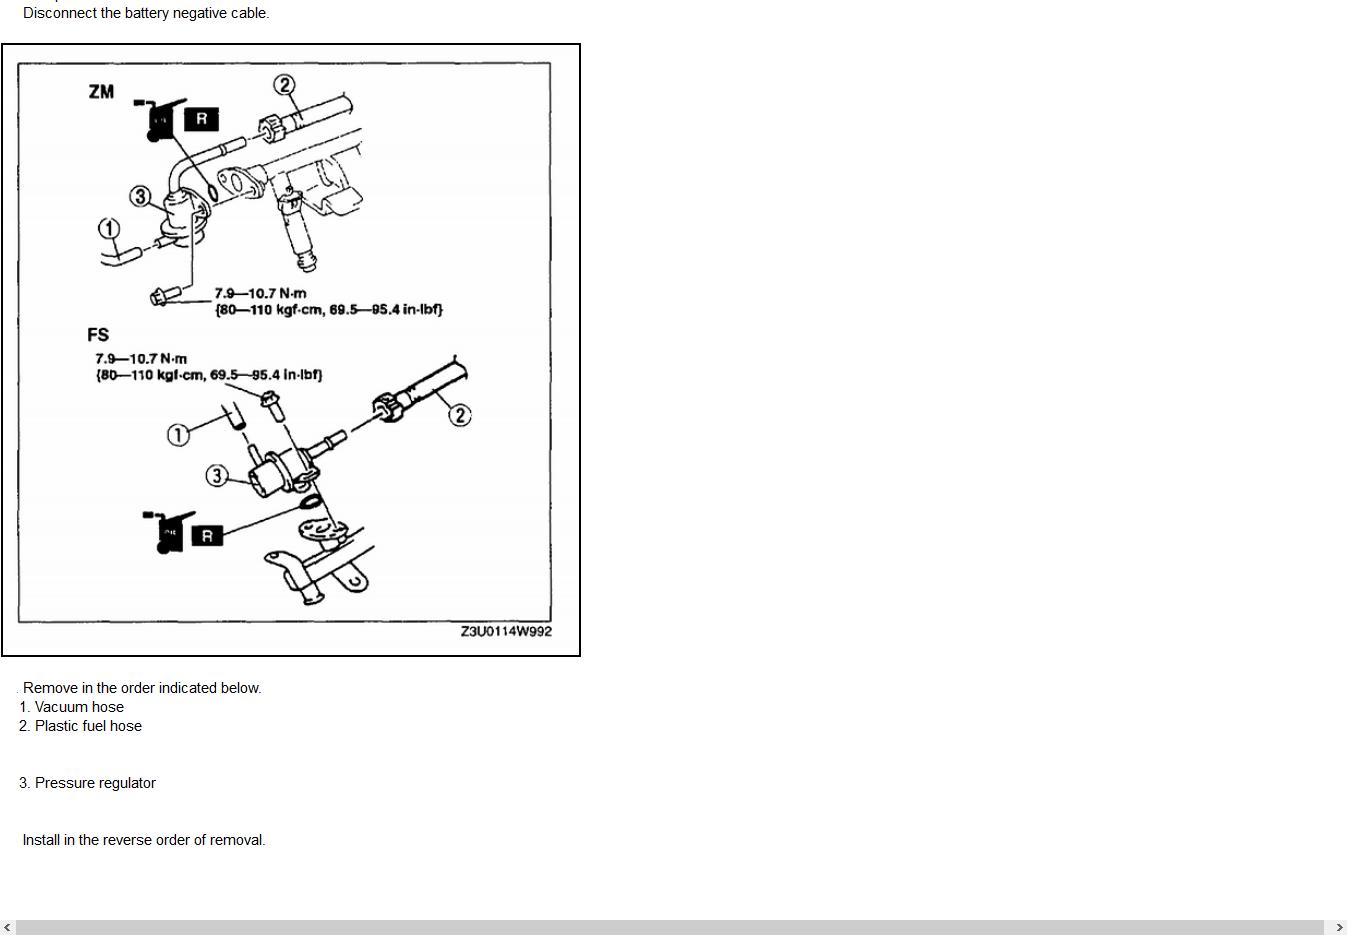 100 2002 mazda protege 5 repair manual 2002 mazda. Black Bedroom Furniture Sets. Home Design Ideas